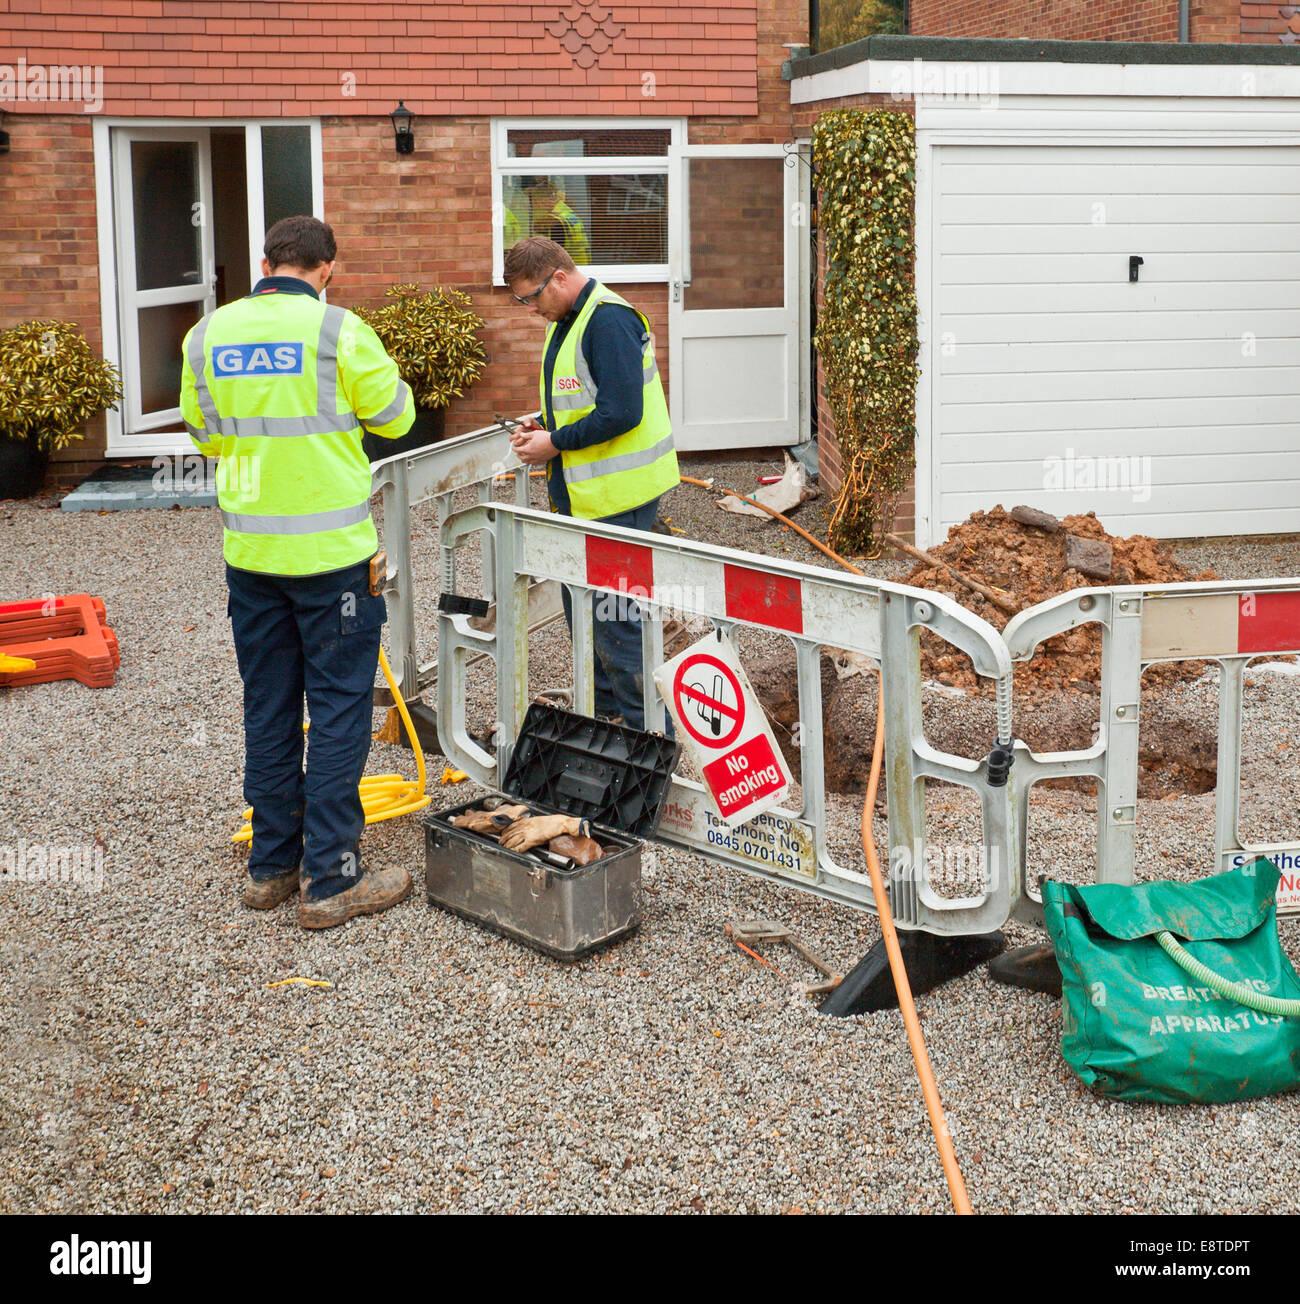 Engineers repairing a domestic gas leak. - Stock Image